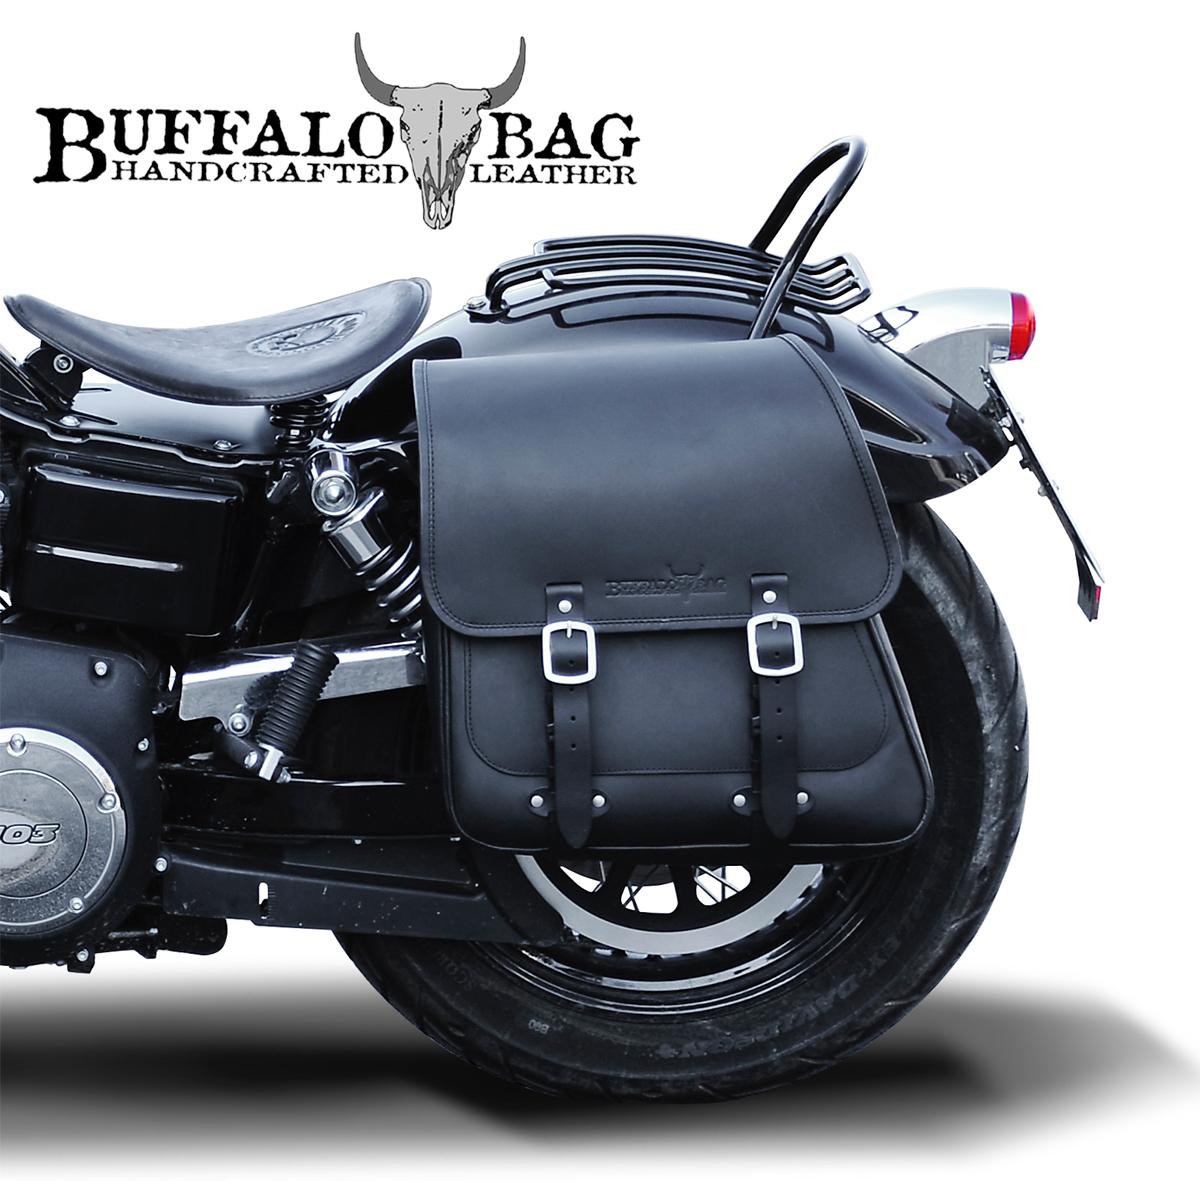 25l saddlebag harley dyna street bob fat bob 2017 buffalo. Black Bedroom Furniture Sets. Home Design Ideas